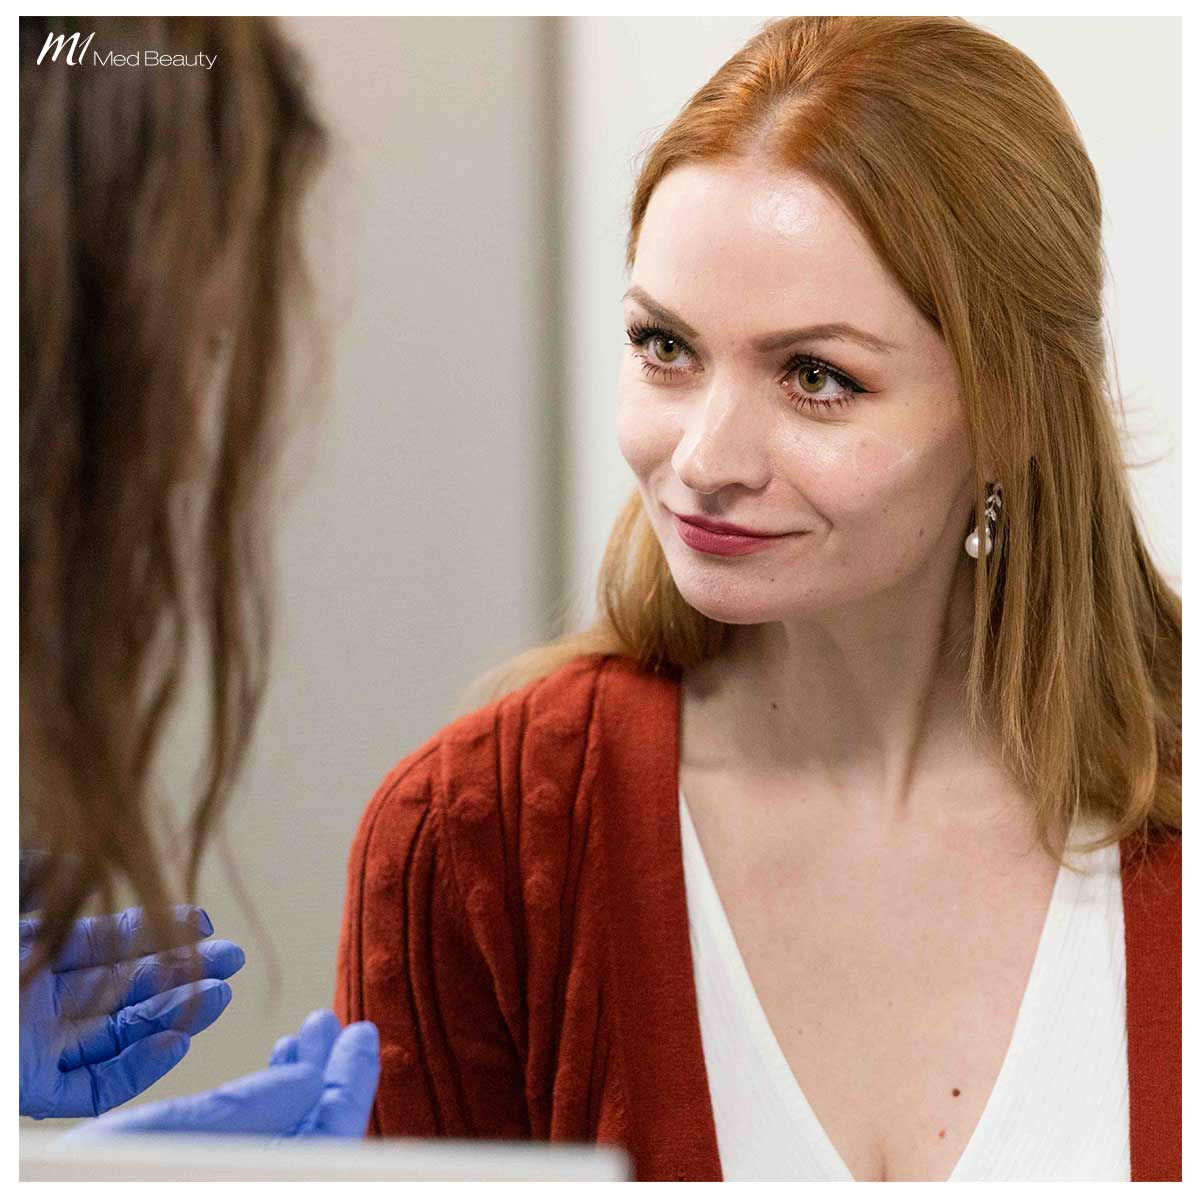 cheek filler treatment at M1 Med Beauty - consultation